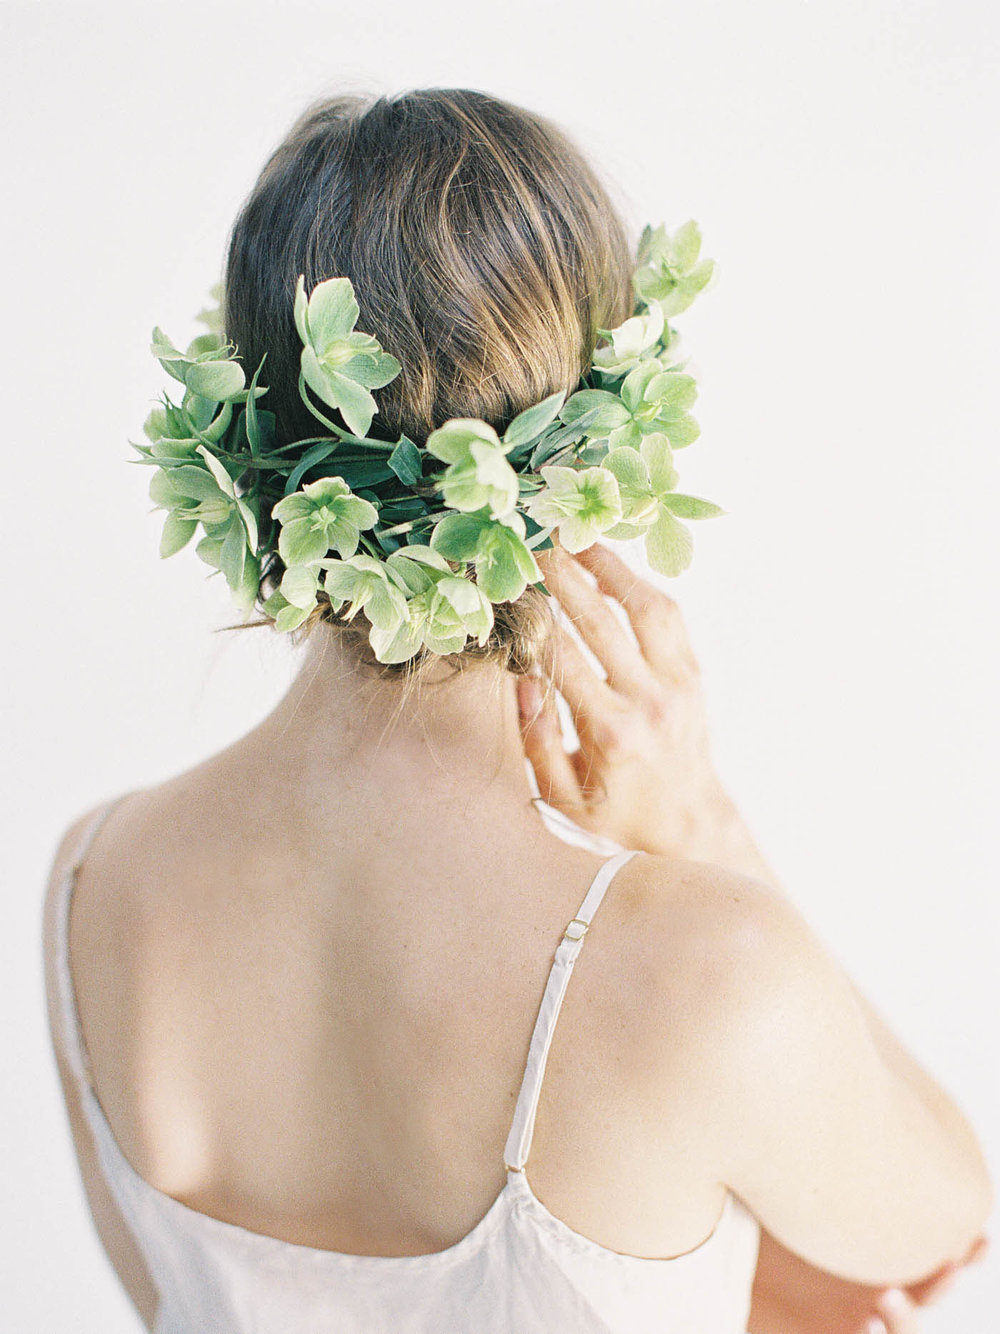 floral-crown-9-Jen_Huang-006839-R1-E007.jpg